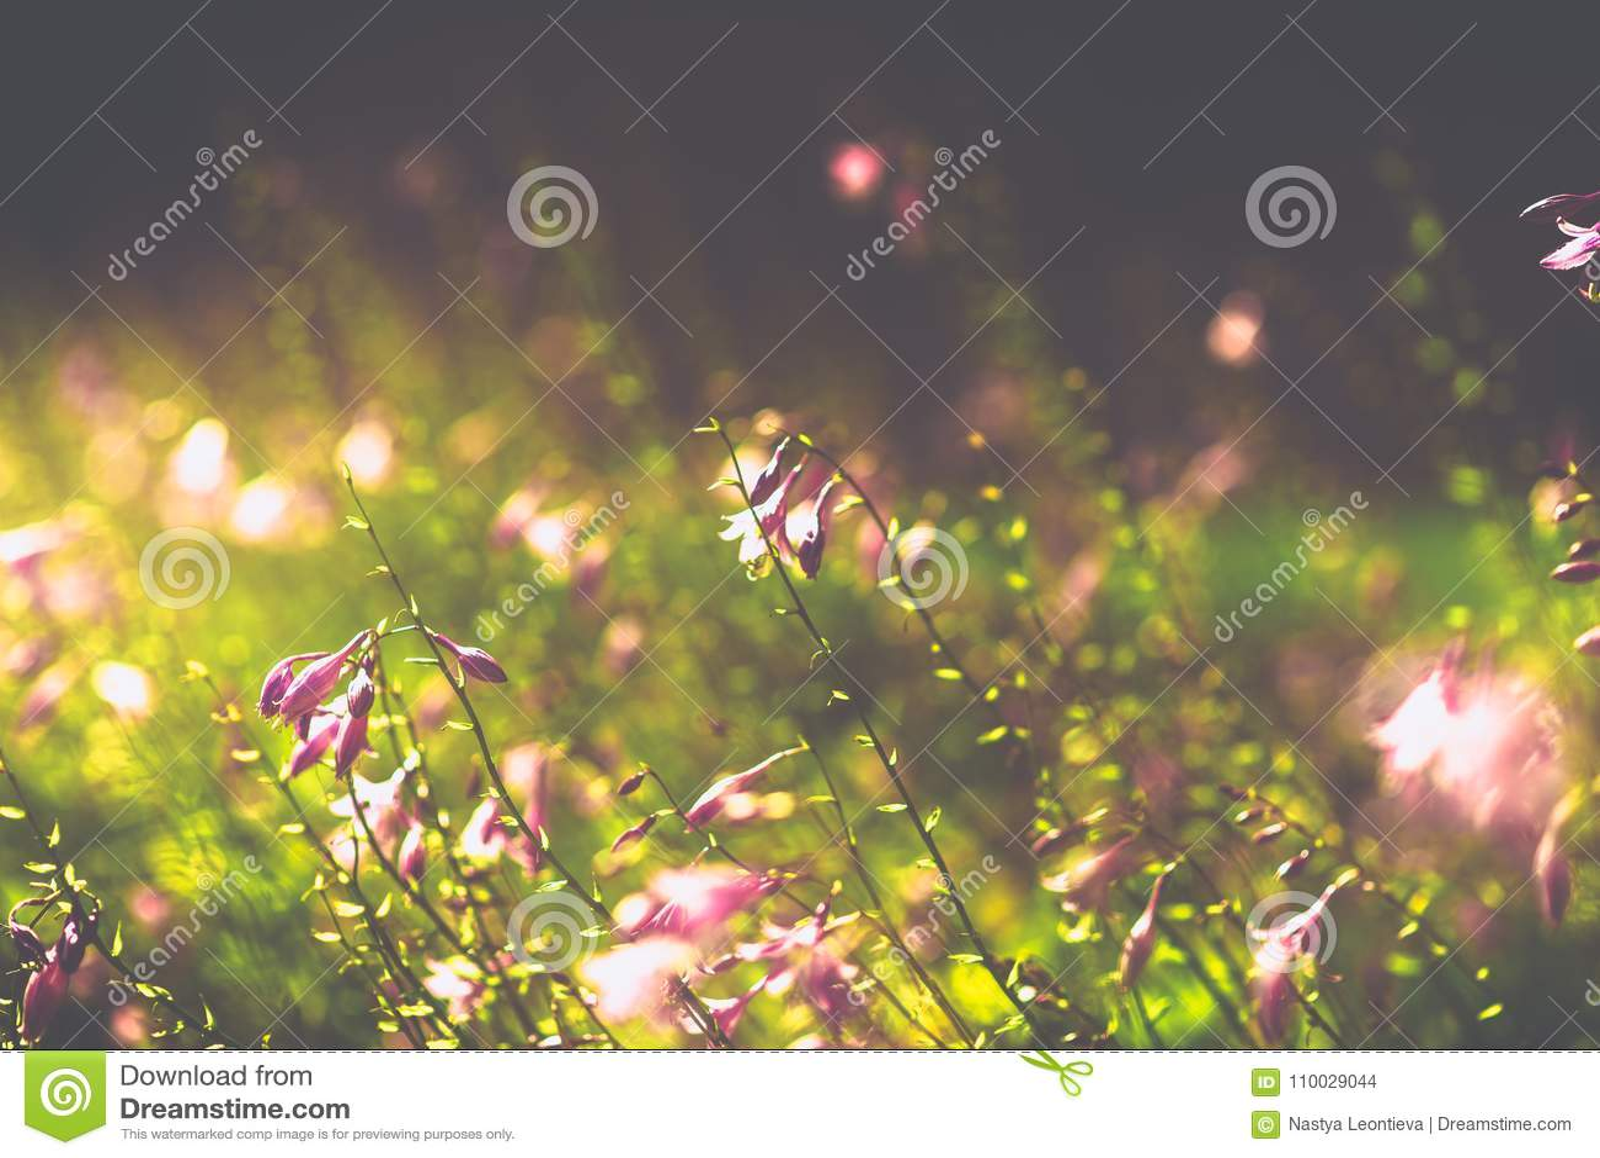 Violette dichte omhooggaande bloemen vage achtergrond